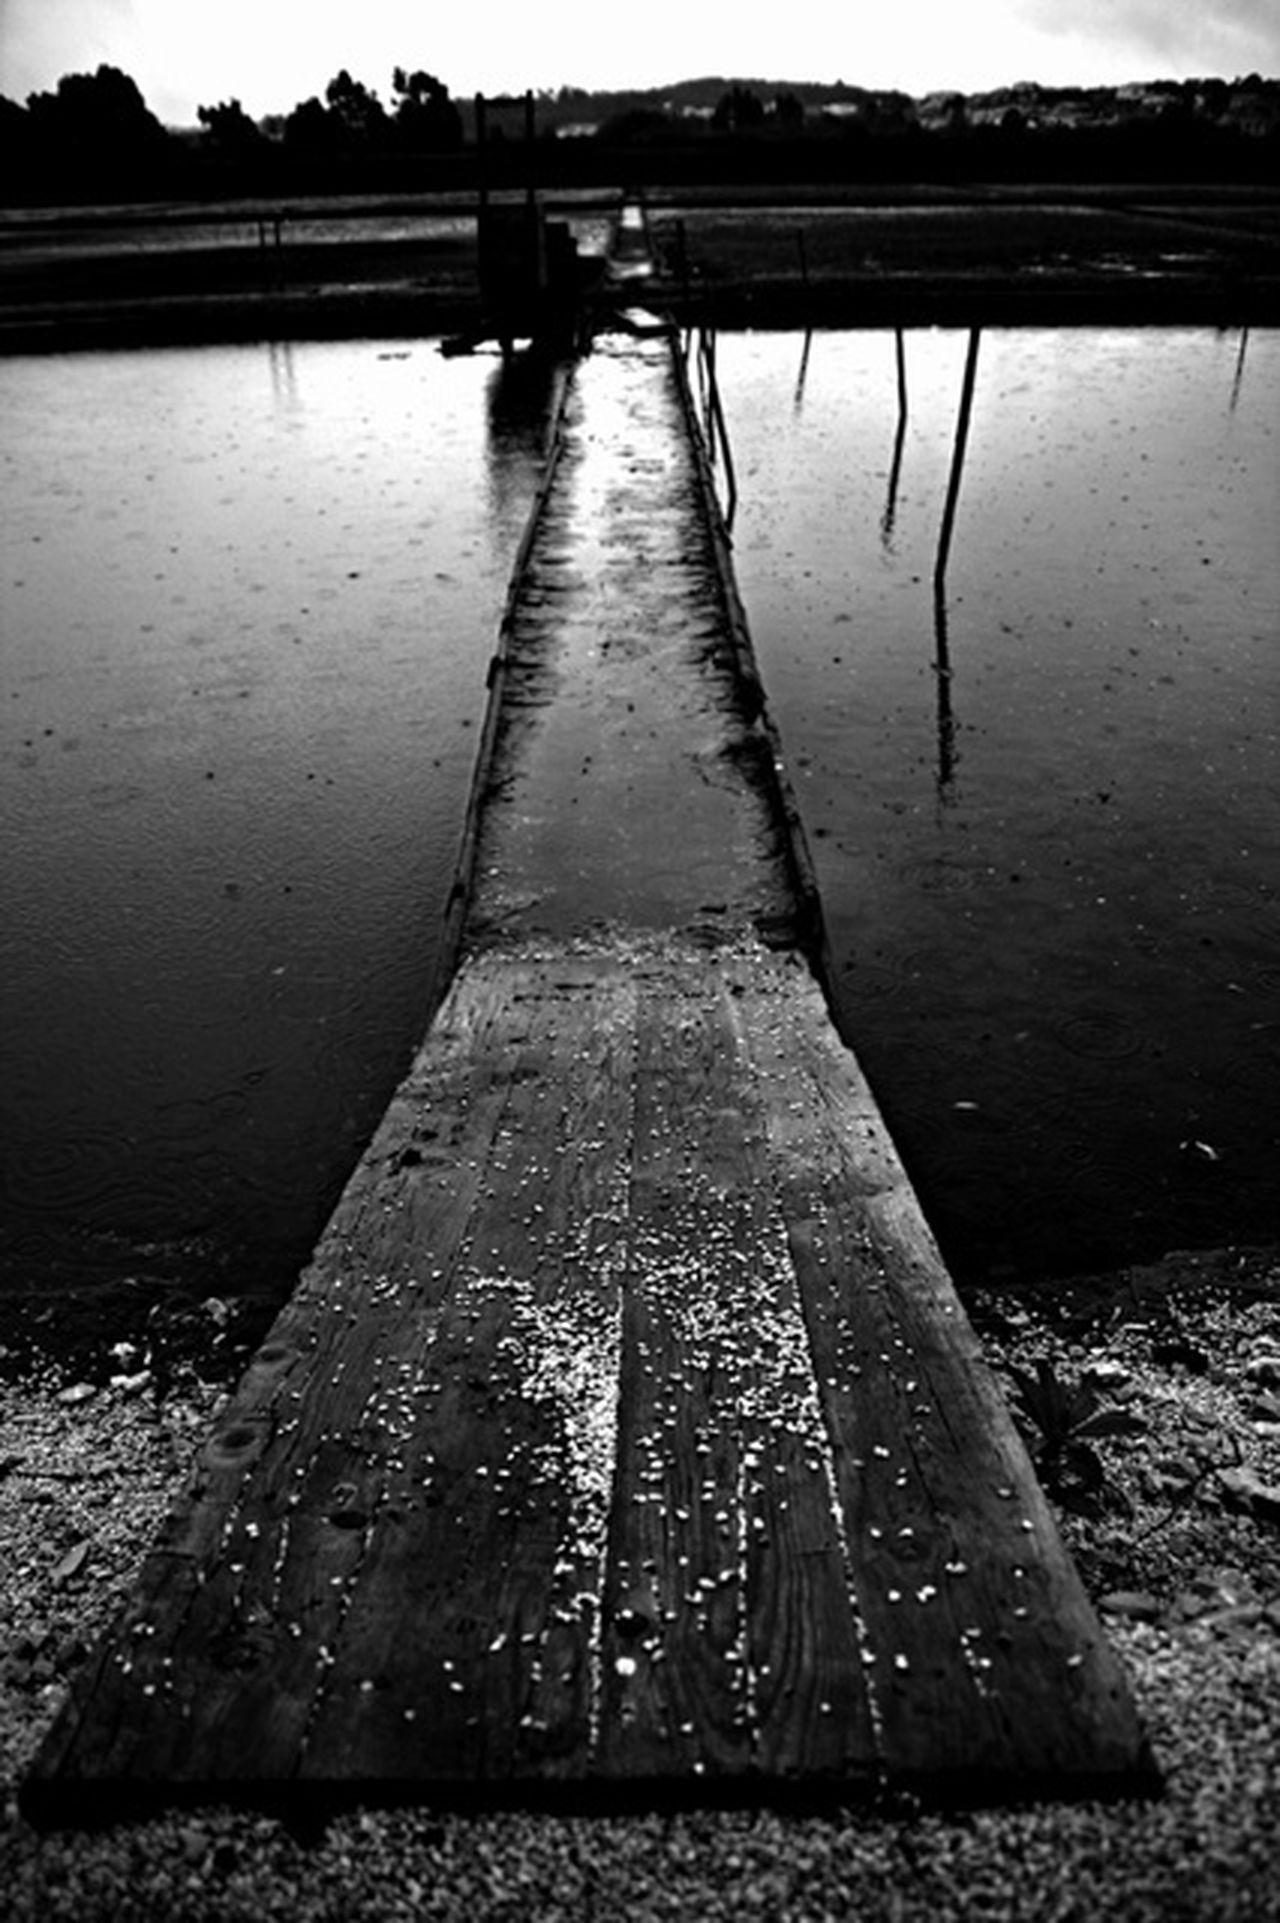 Photorv Saltevaporationpond Salt Evaporation Pond Blackandwhite Photography